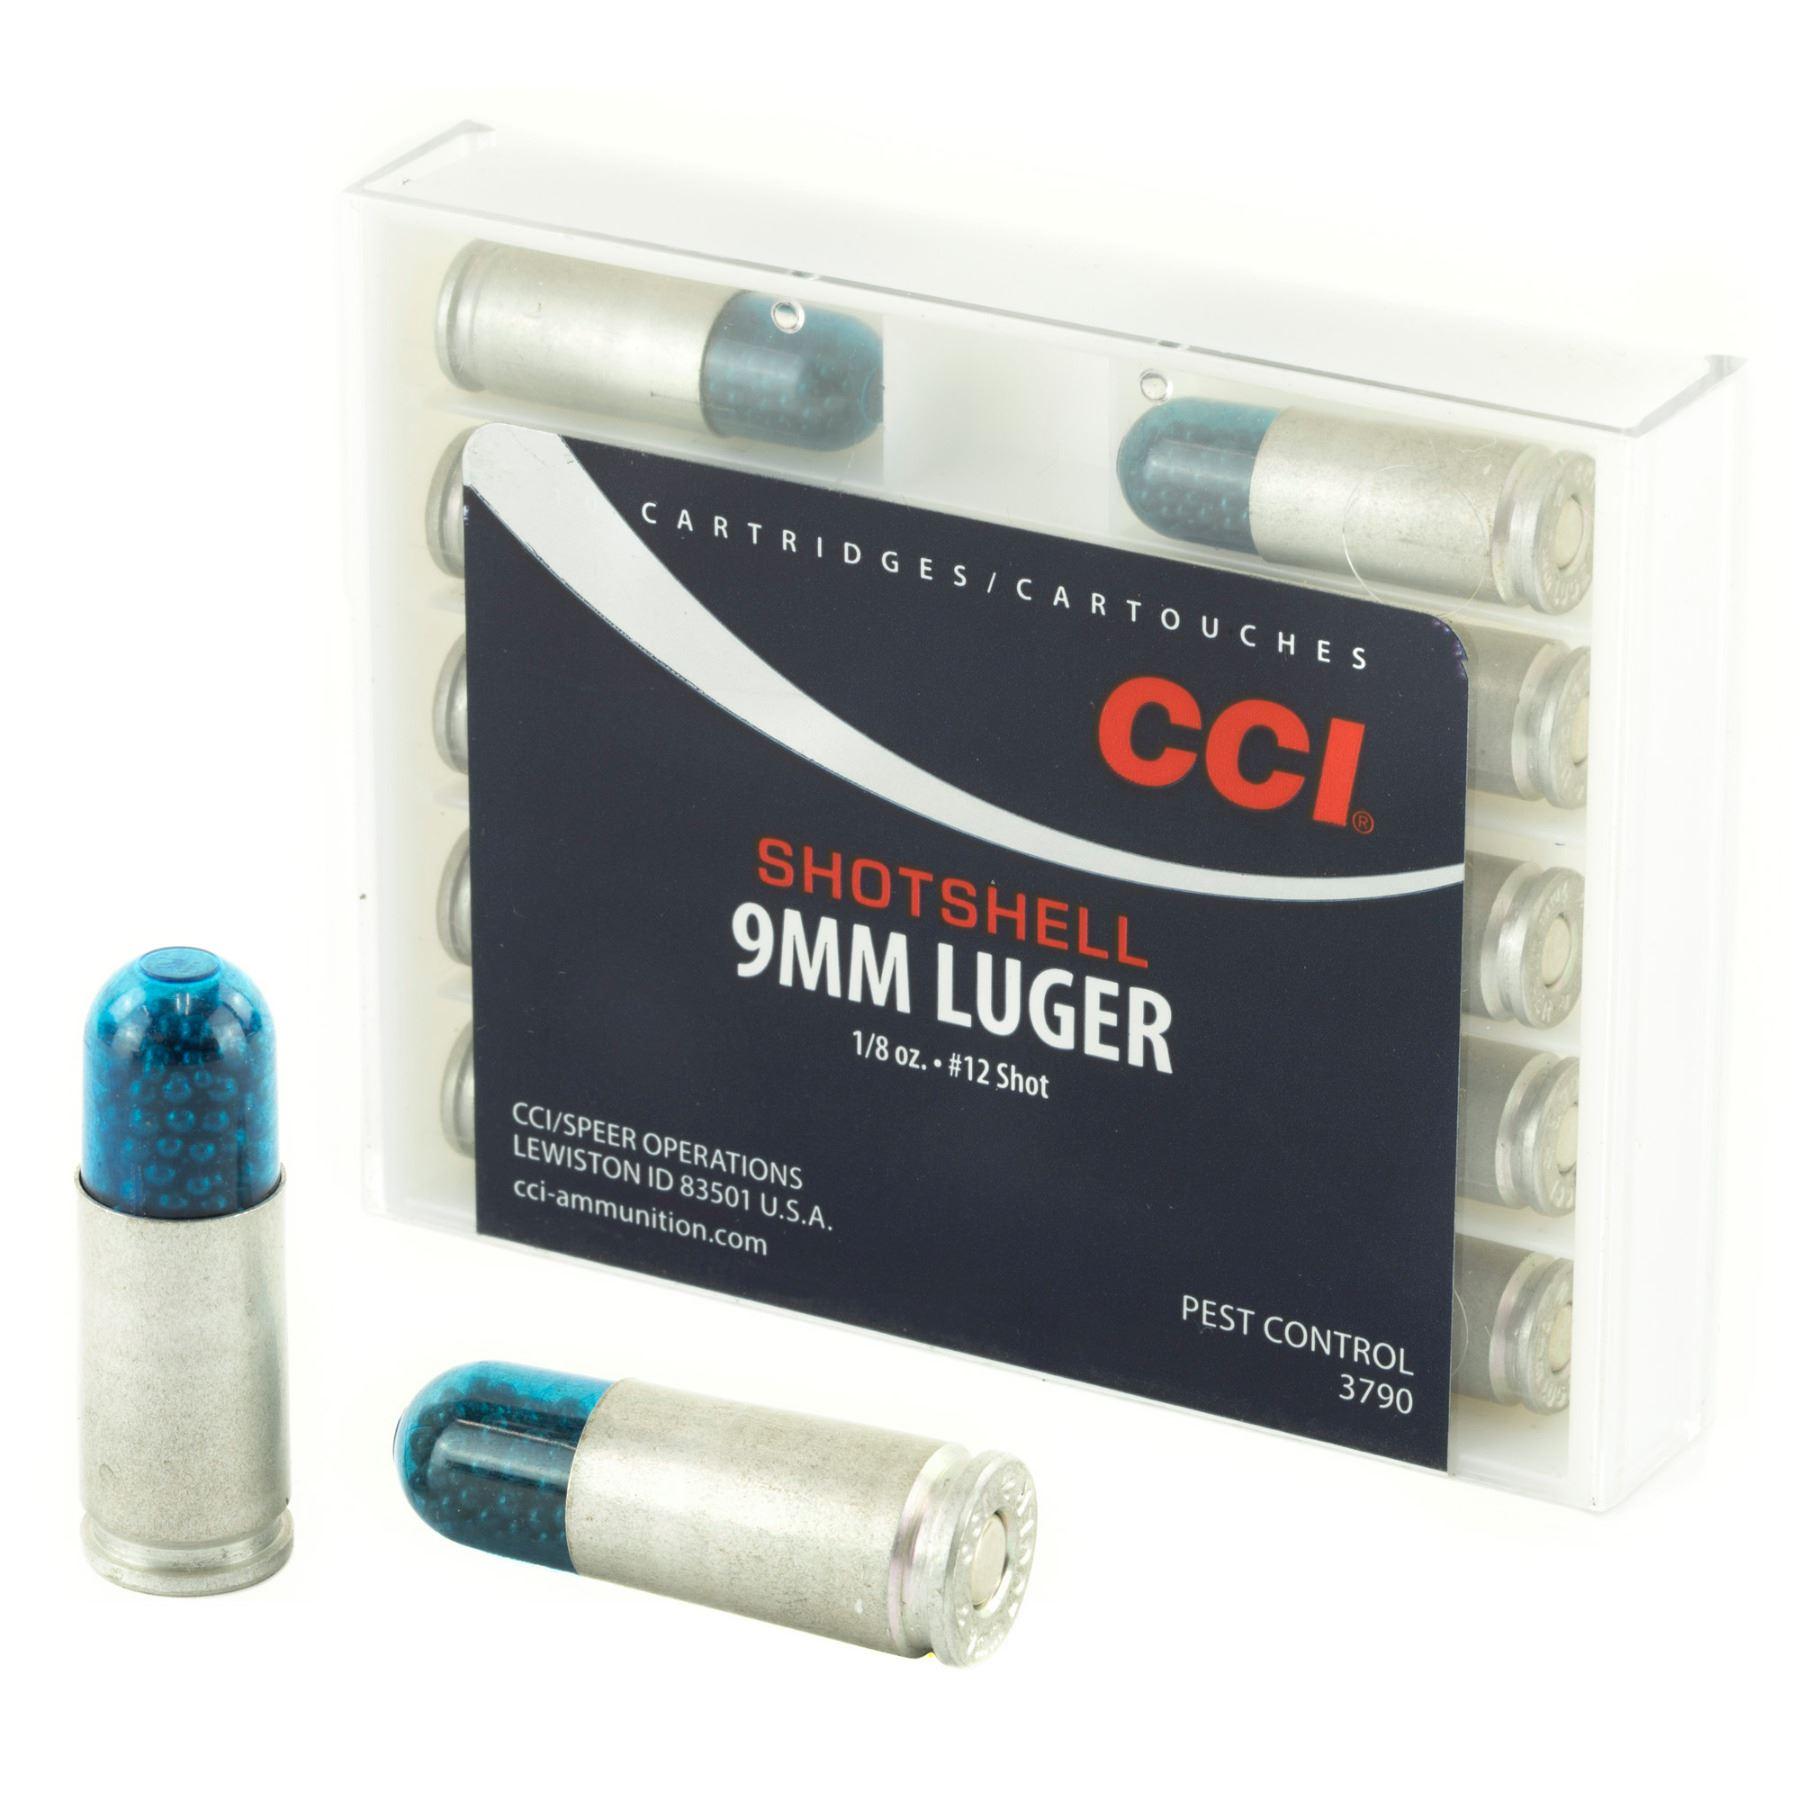 CCI/Speer, Shotshell, 9MM, 64 Grain, Shotshell, #12 Shot Size, 10